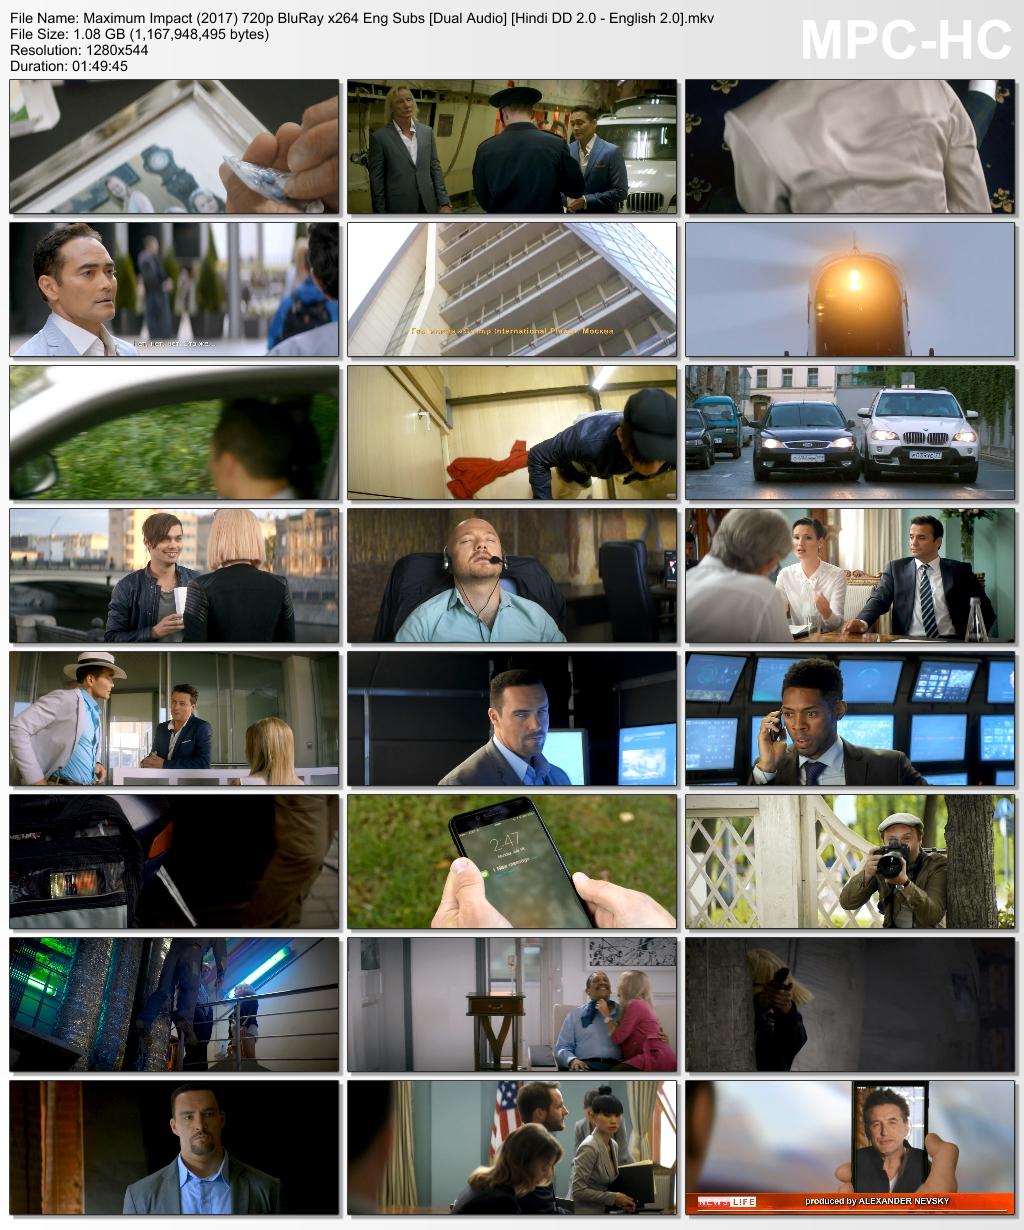 Maximum Impact bingtorrent Screen shots